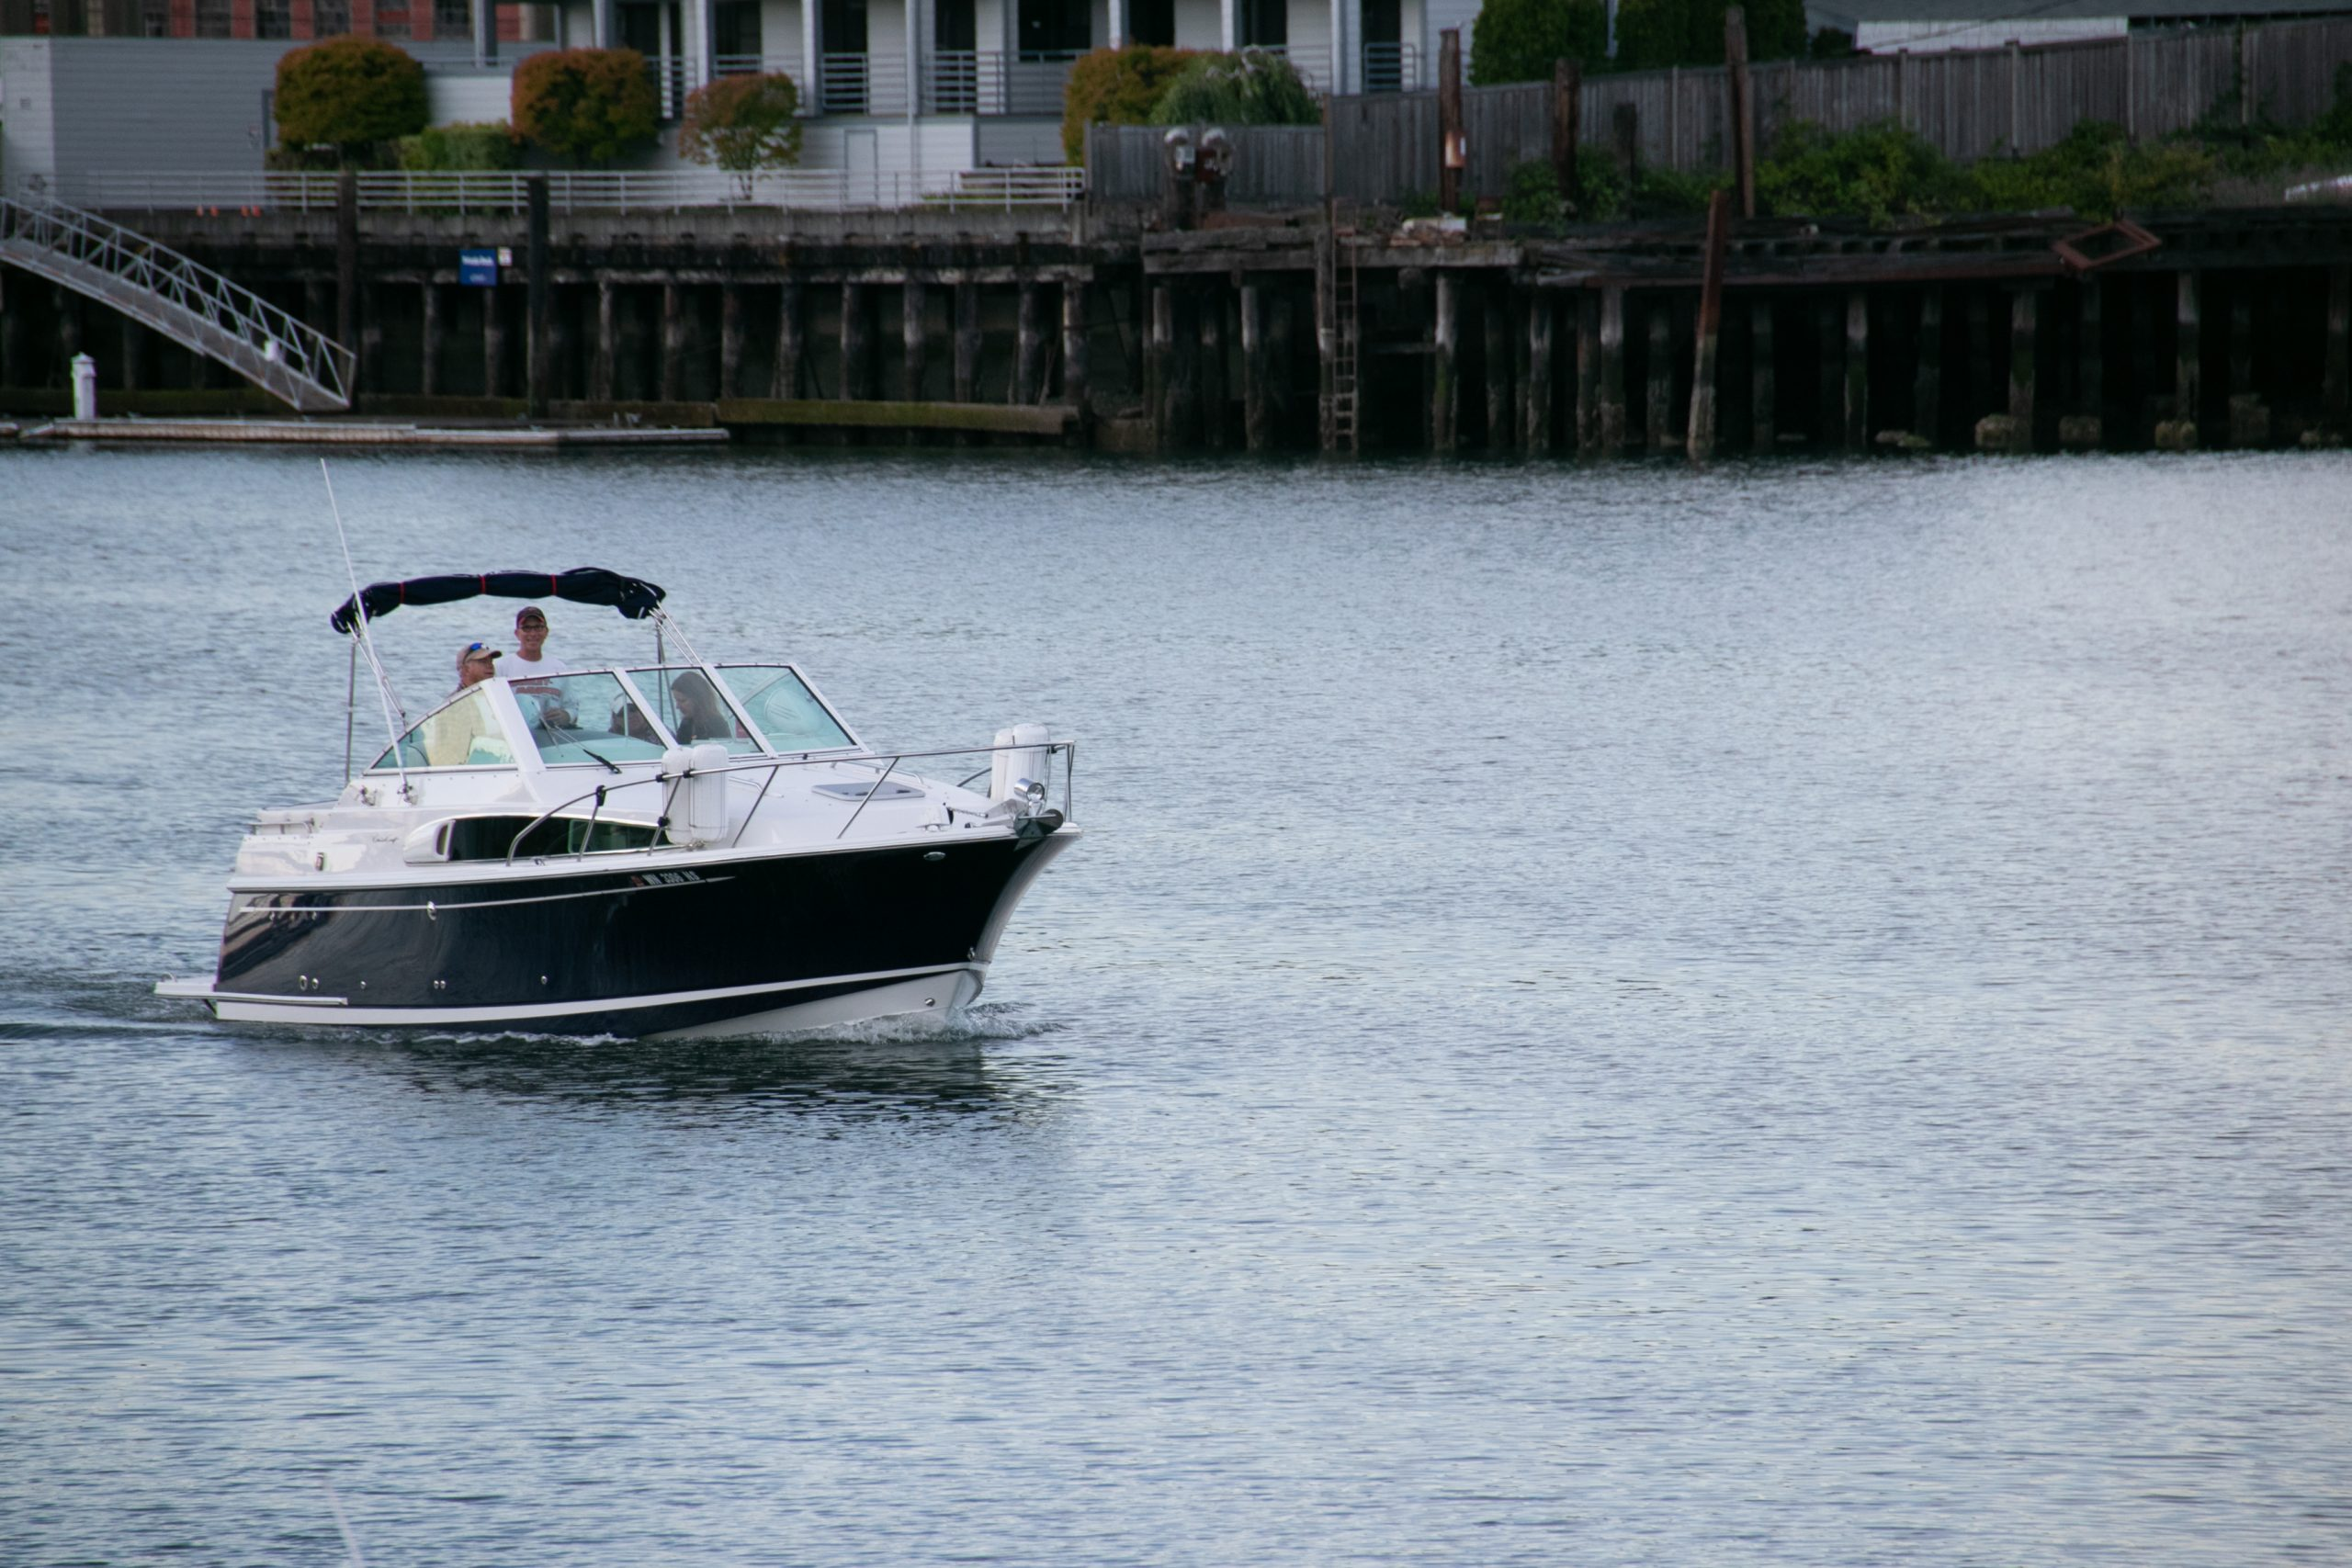 People On Motorboat On Water Near Shore